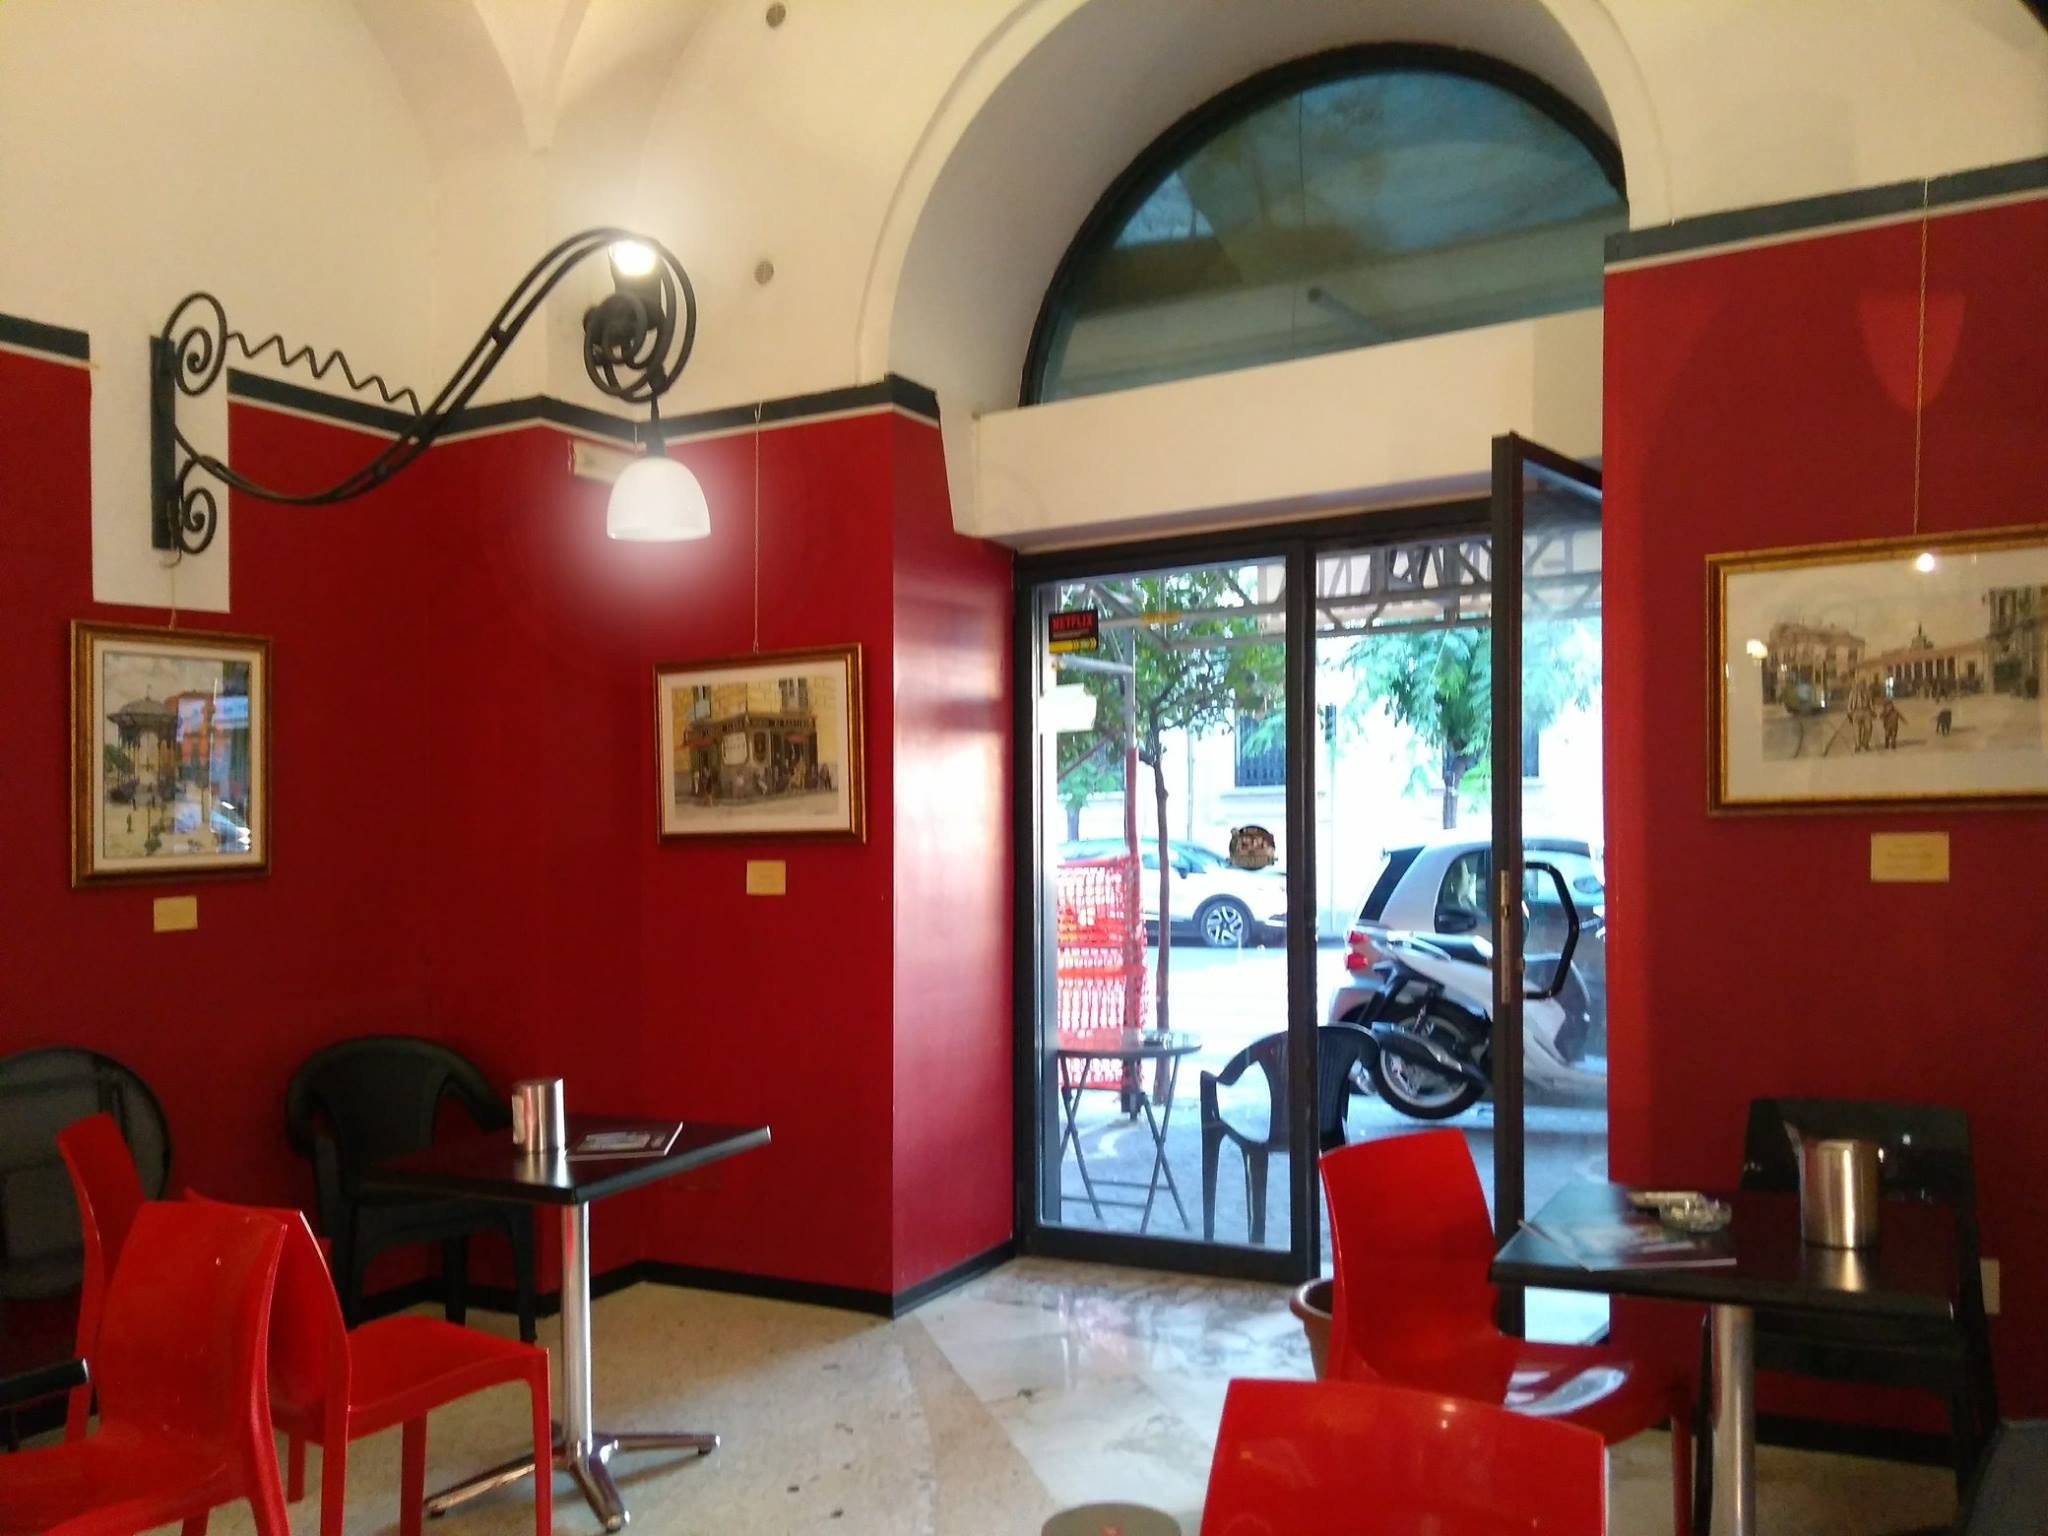 L'angolo di Cesino al Bar Fontana